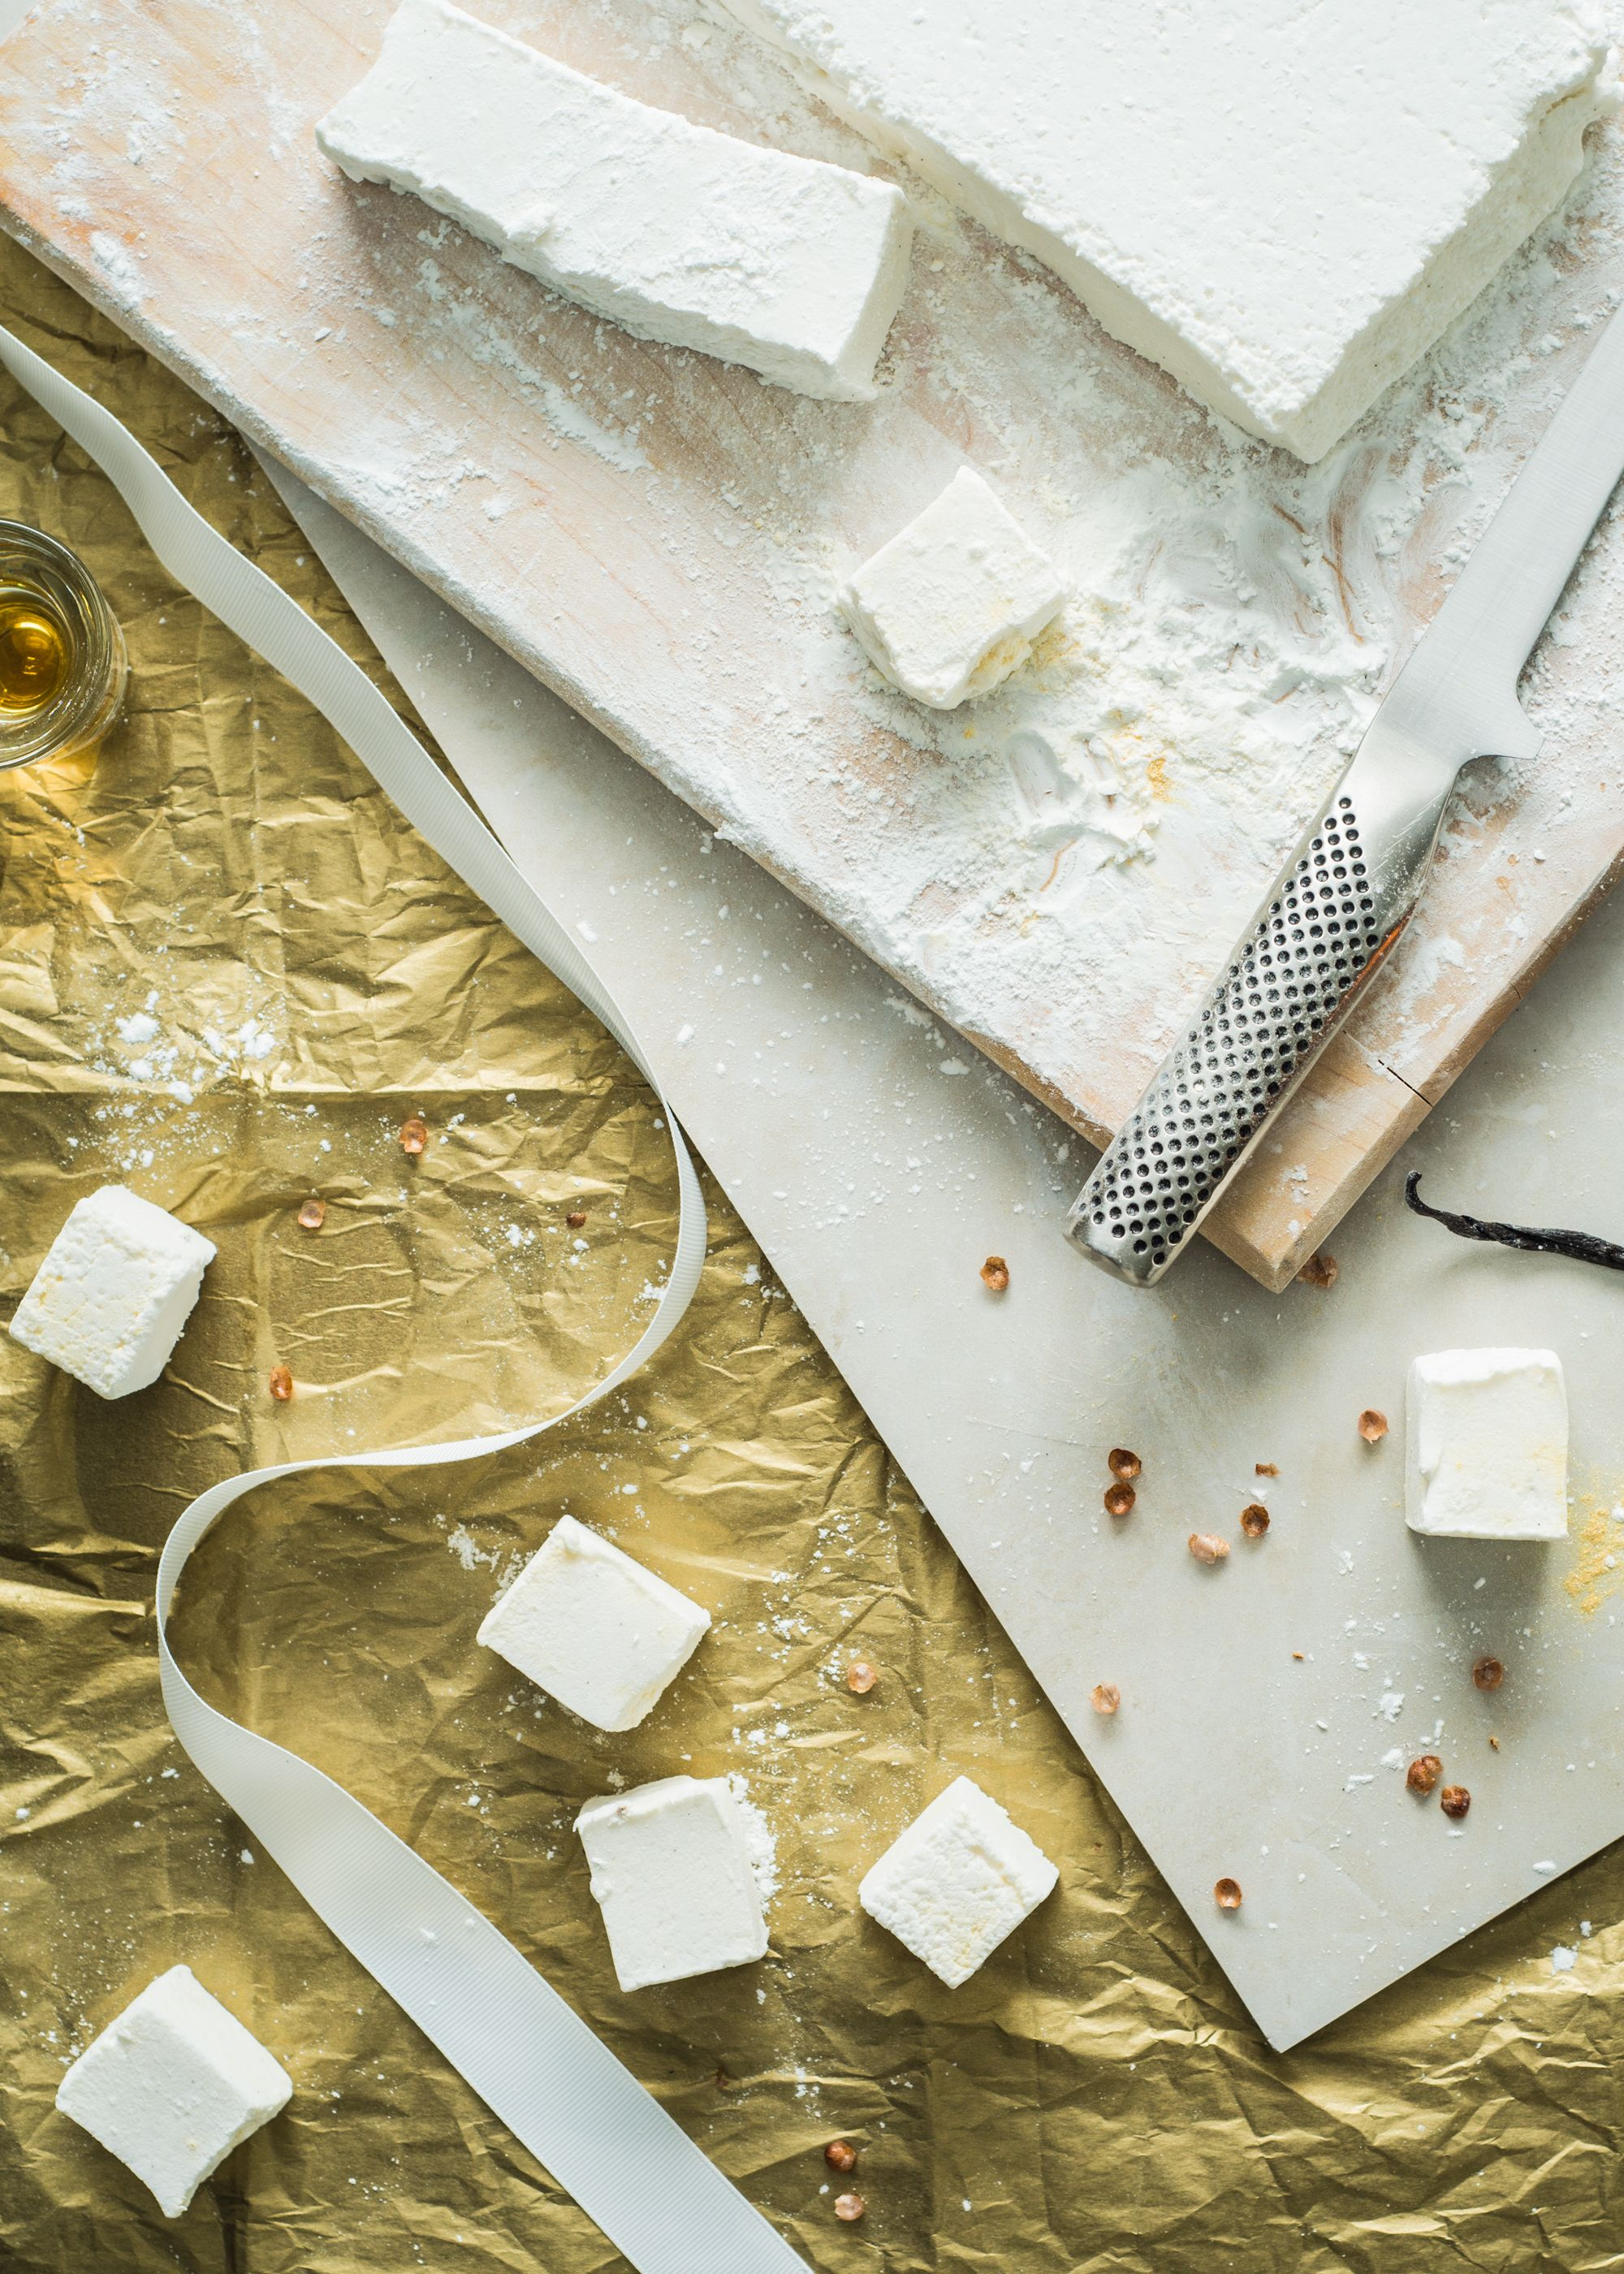 Calvados Marshmallows - Pecan Buttered Rum Steamers with Calvados Marshmallows